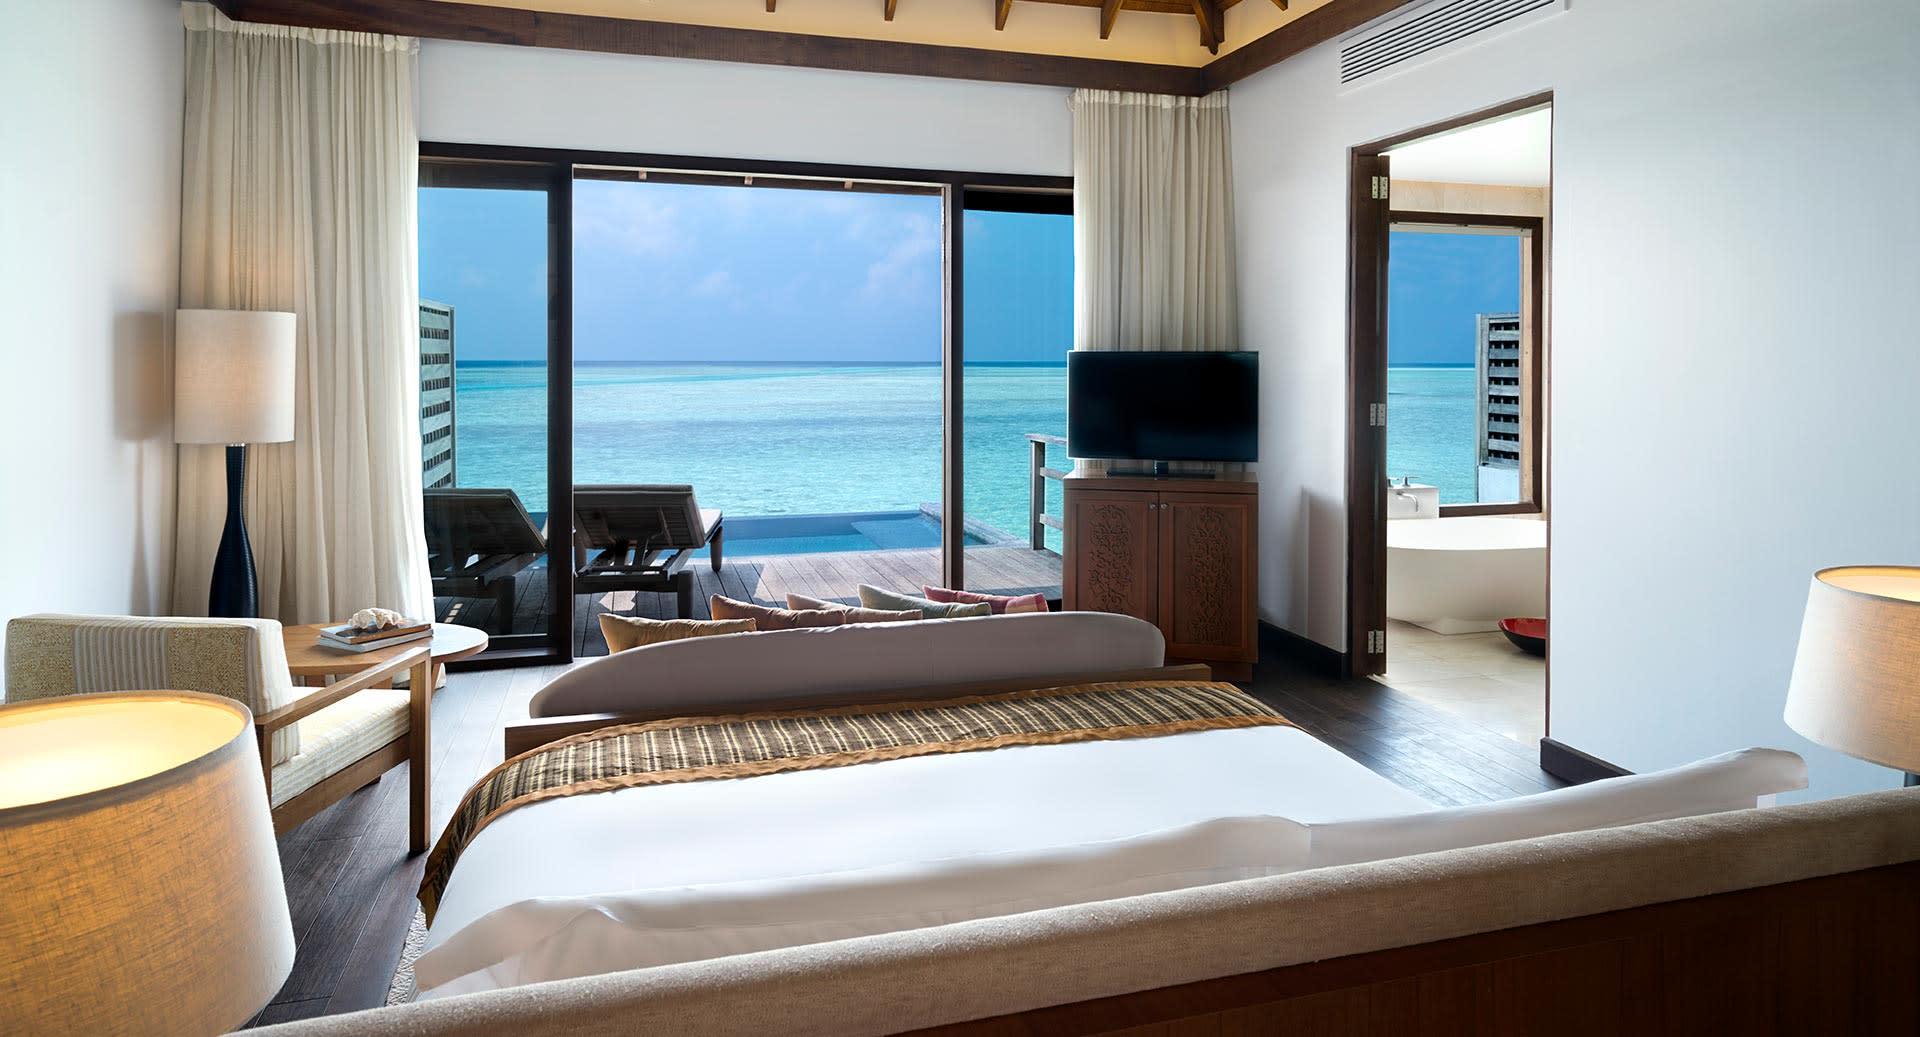 anantara_veli_maldives_deluxe_over_water_pool_bungalow_bedroom_01_1920x1037.jpg